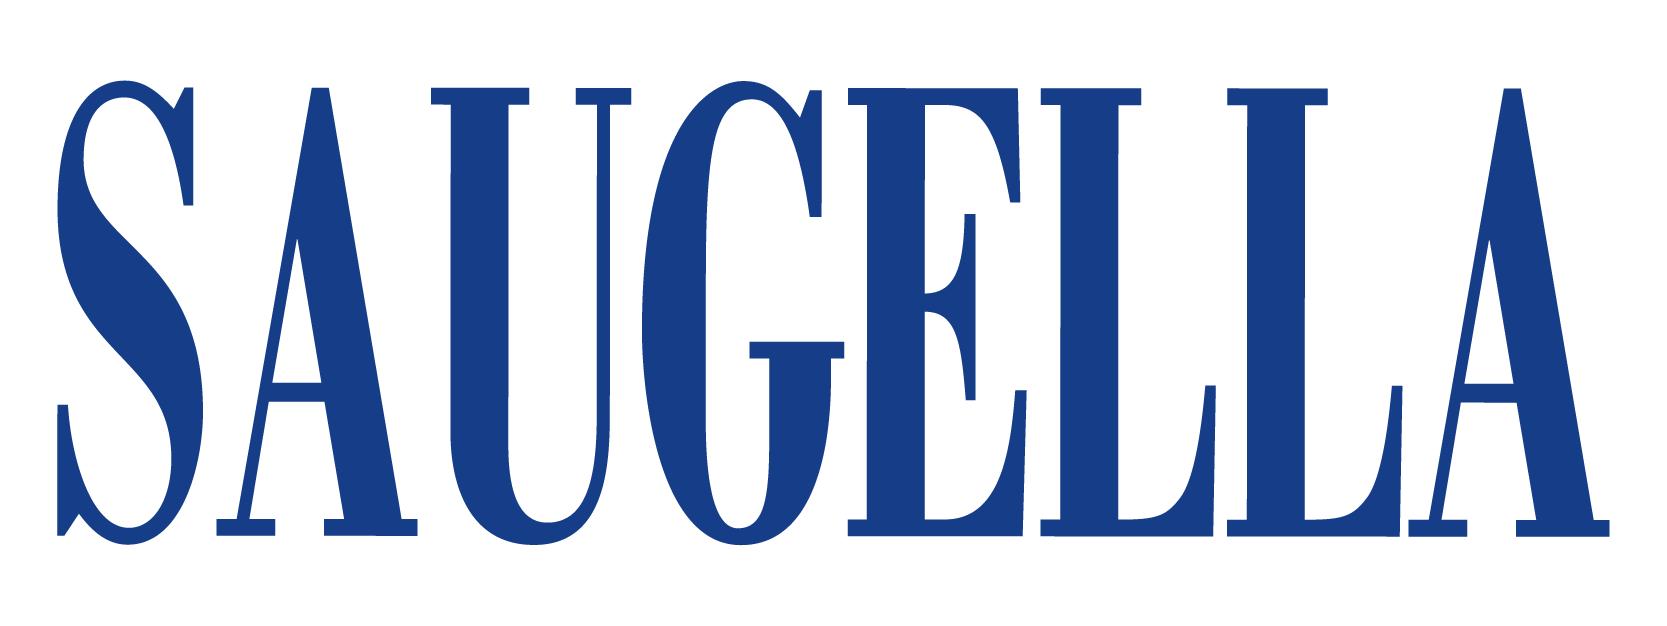 SPL_SAUGELLA